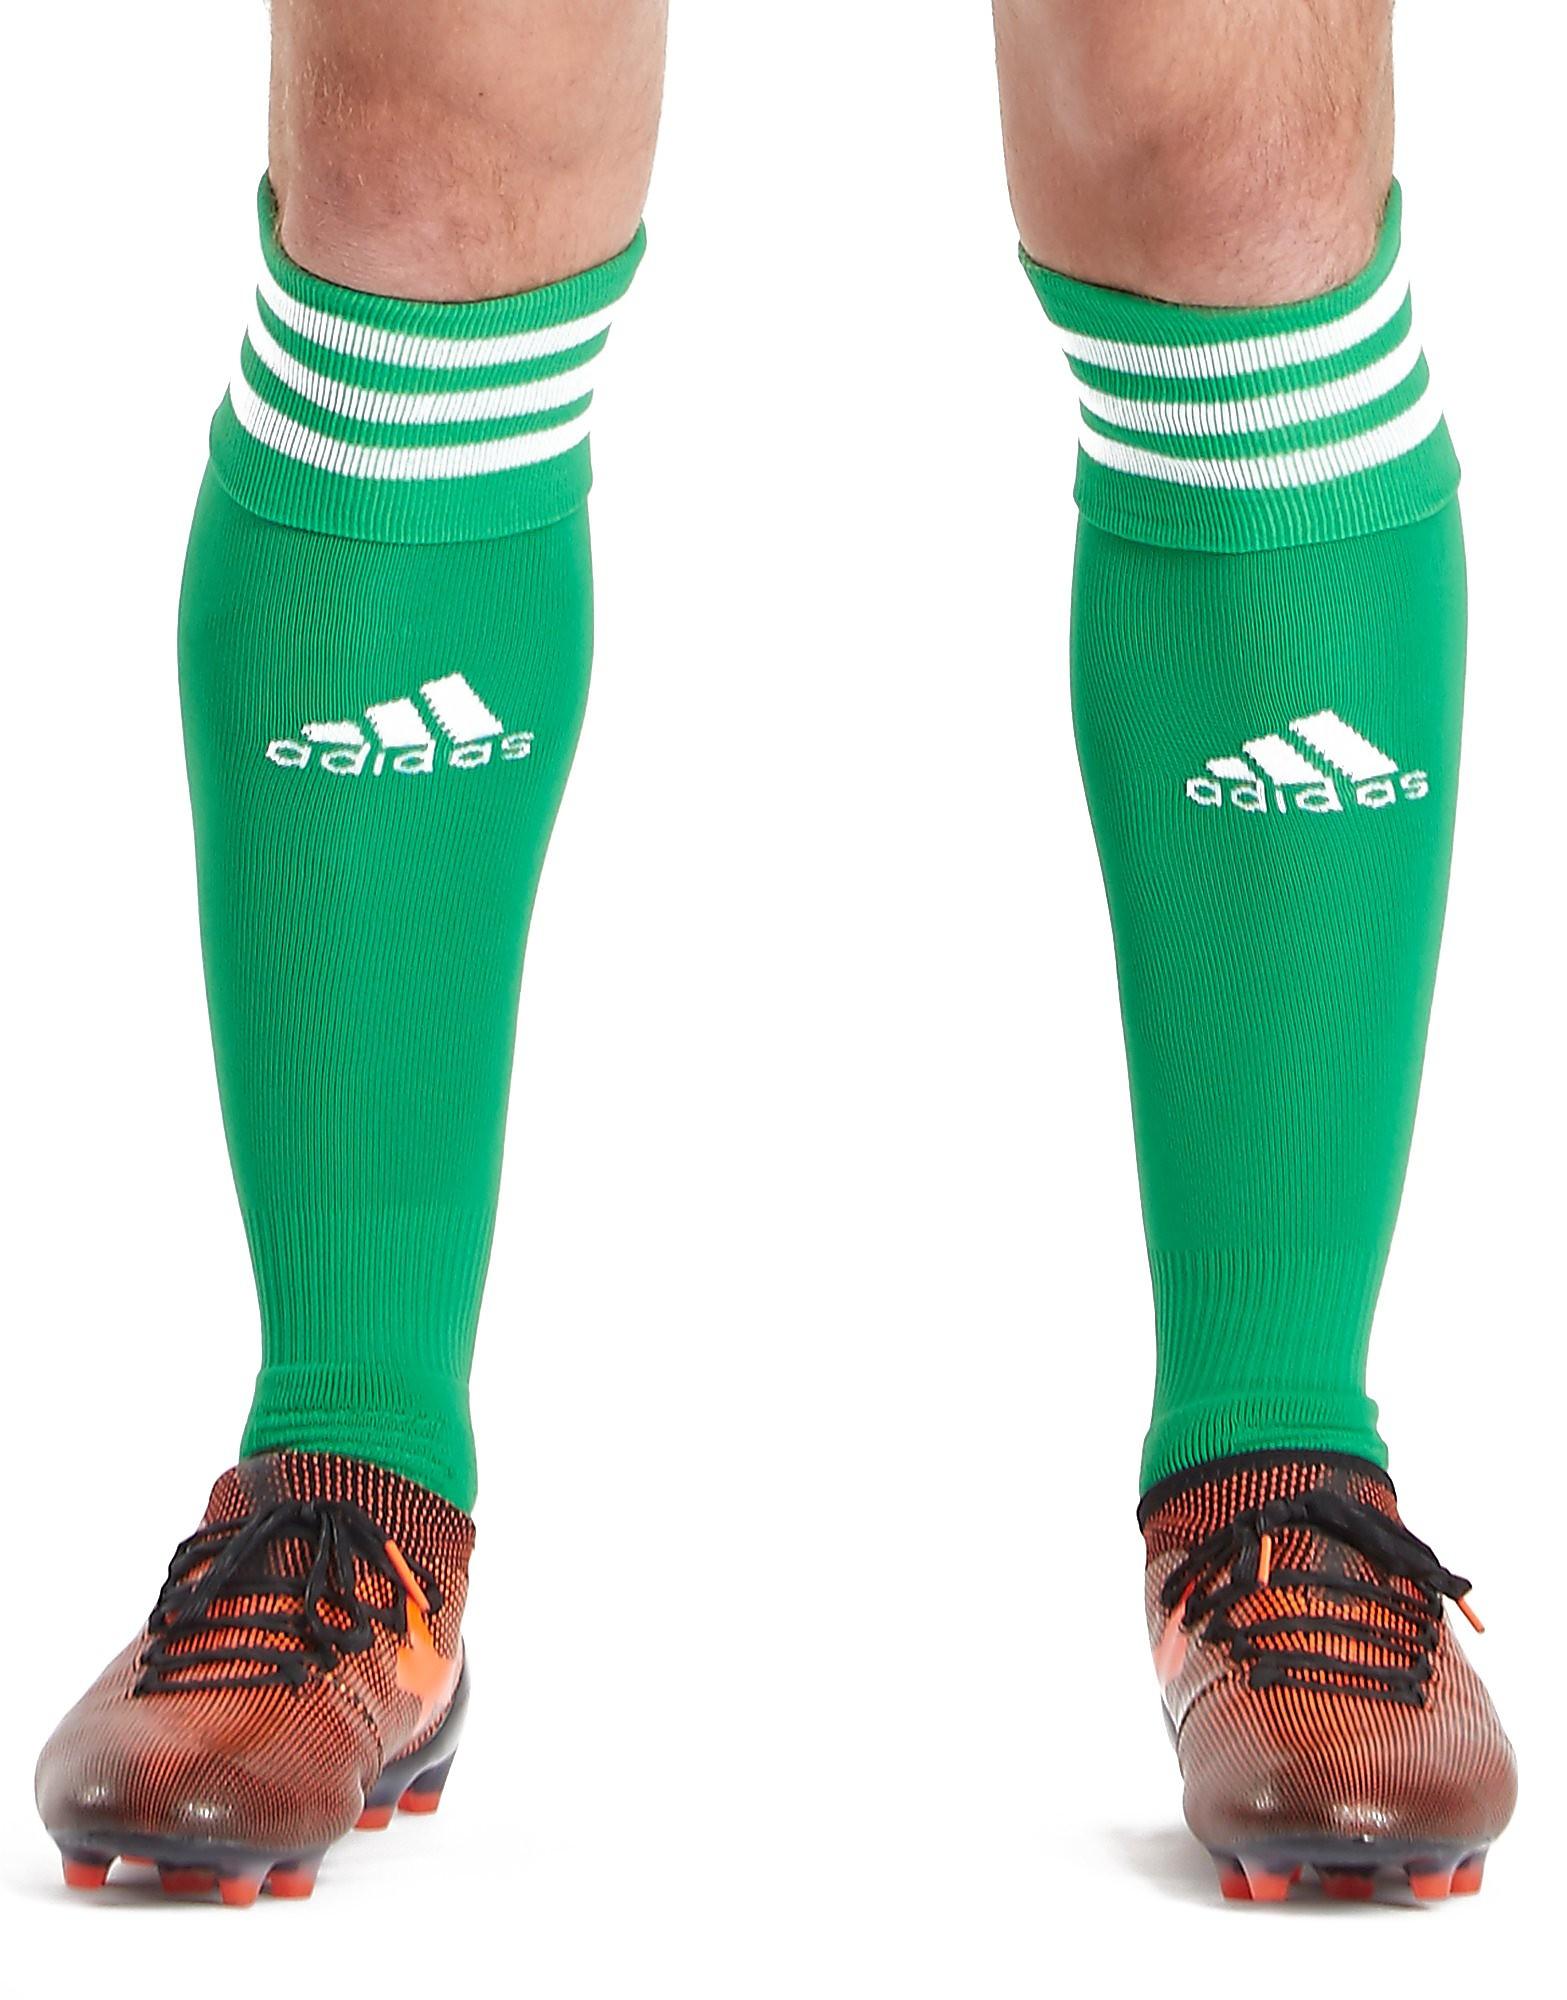 adidas Northern Ireland 2017/18 Home Socks